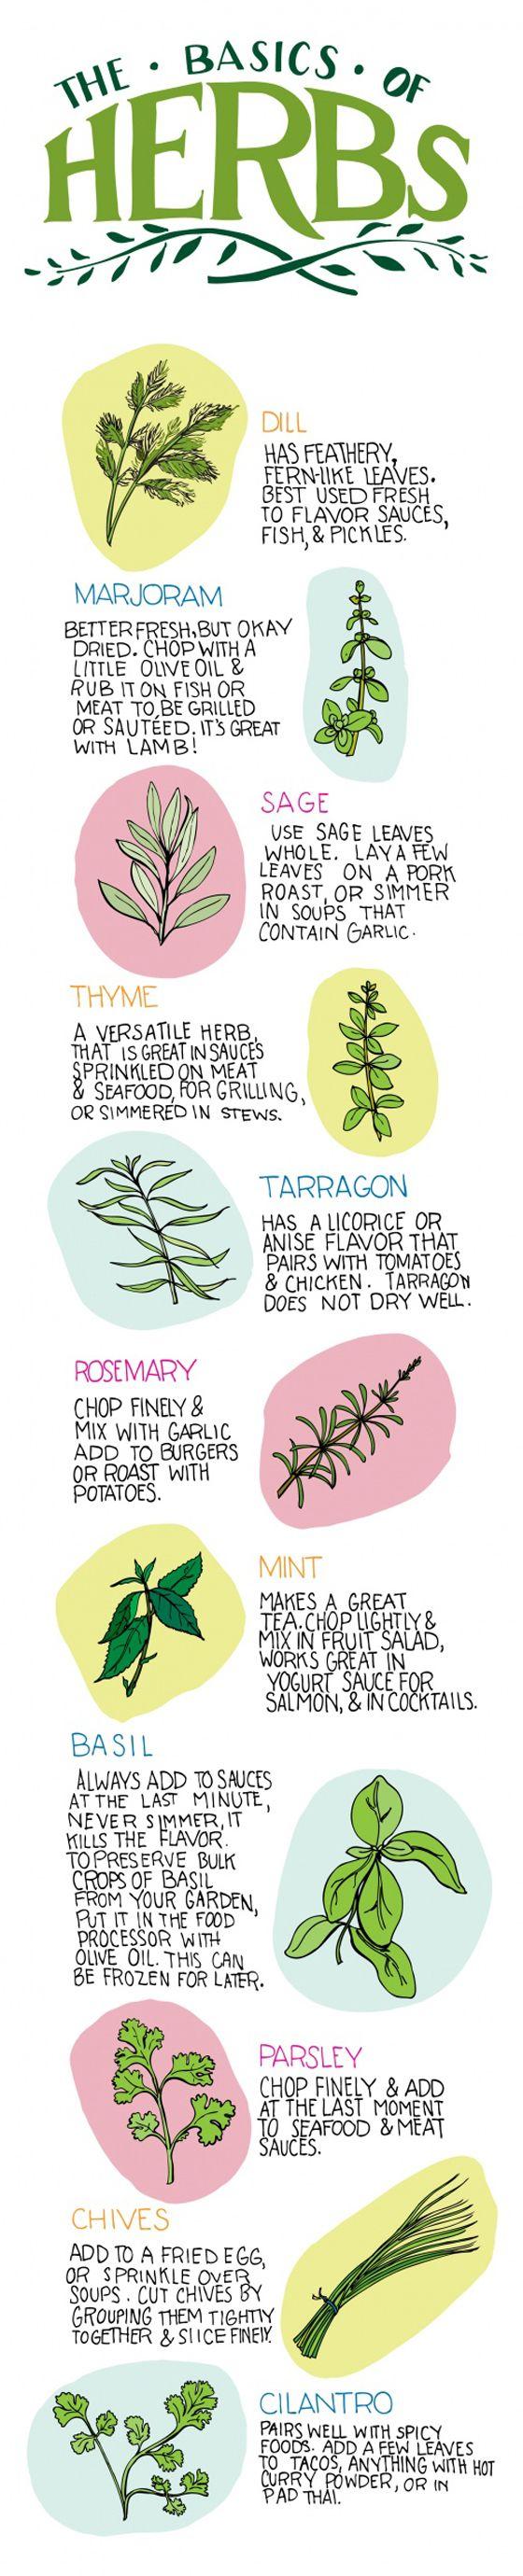 The Basics of Herbs.